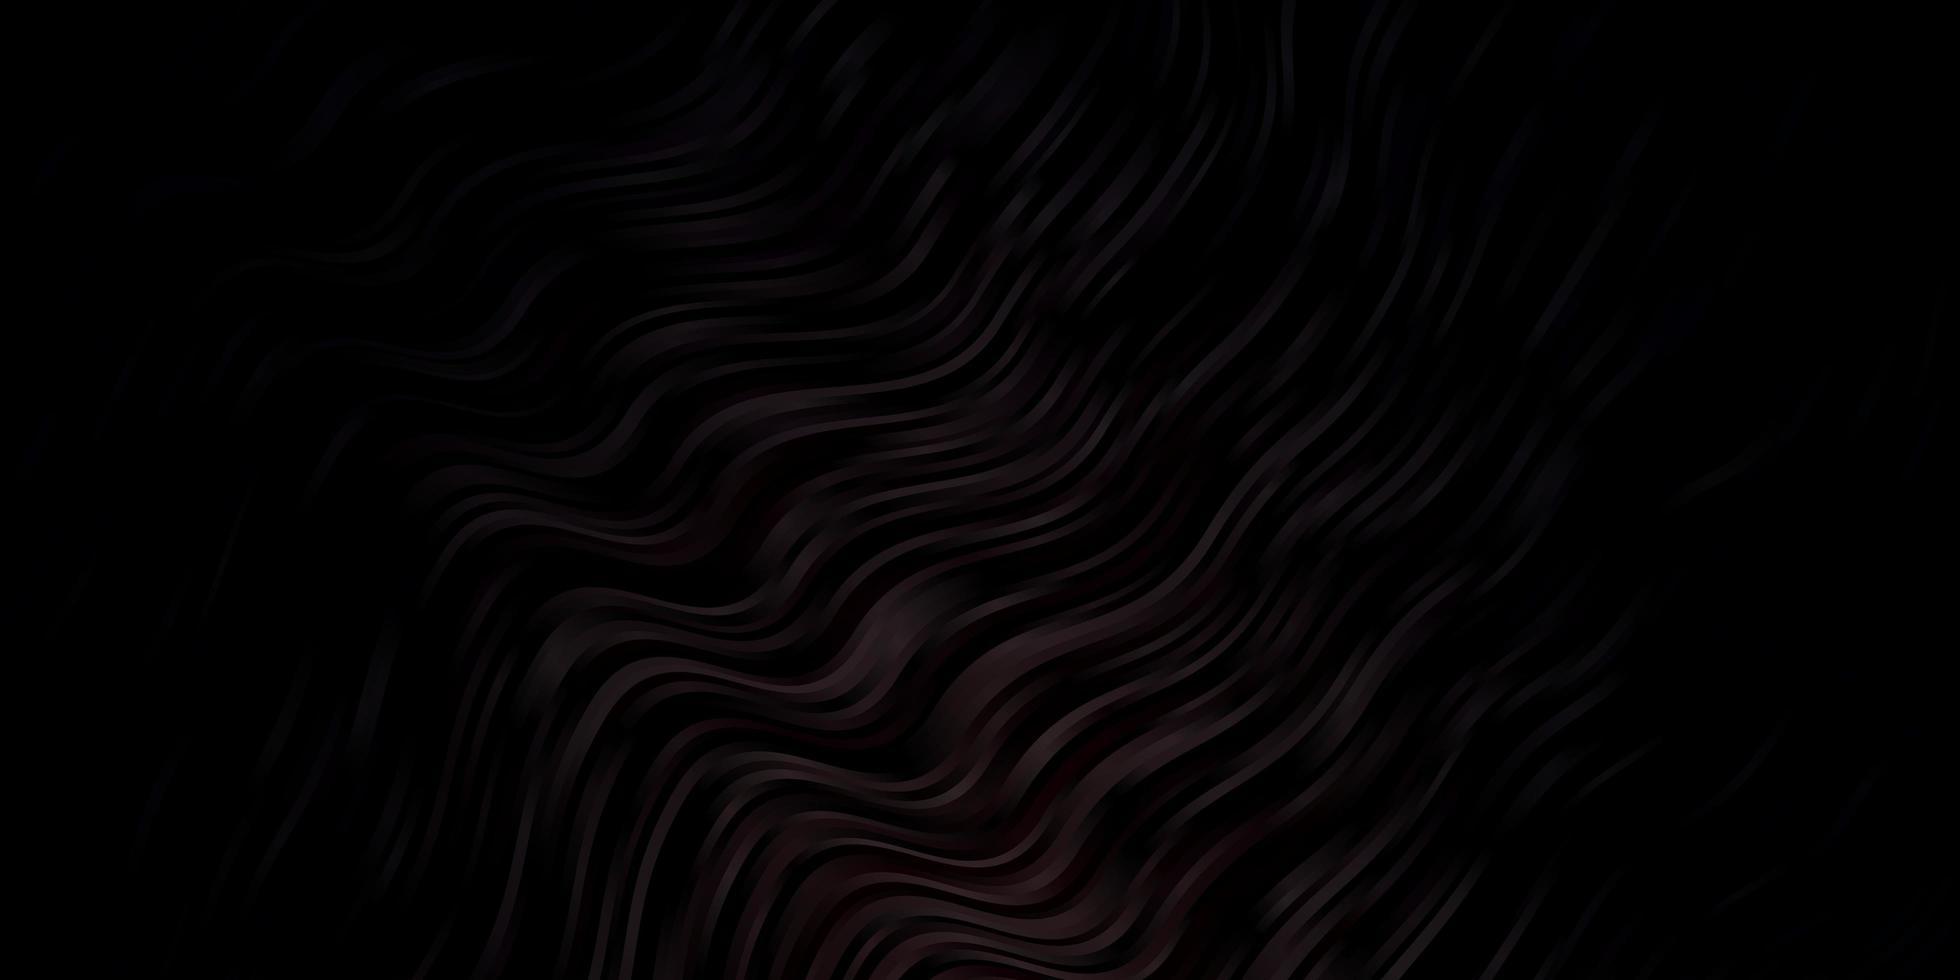 dunkelbraune Vektorbeschaffenheit mit Kurven. vektor